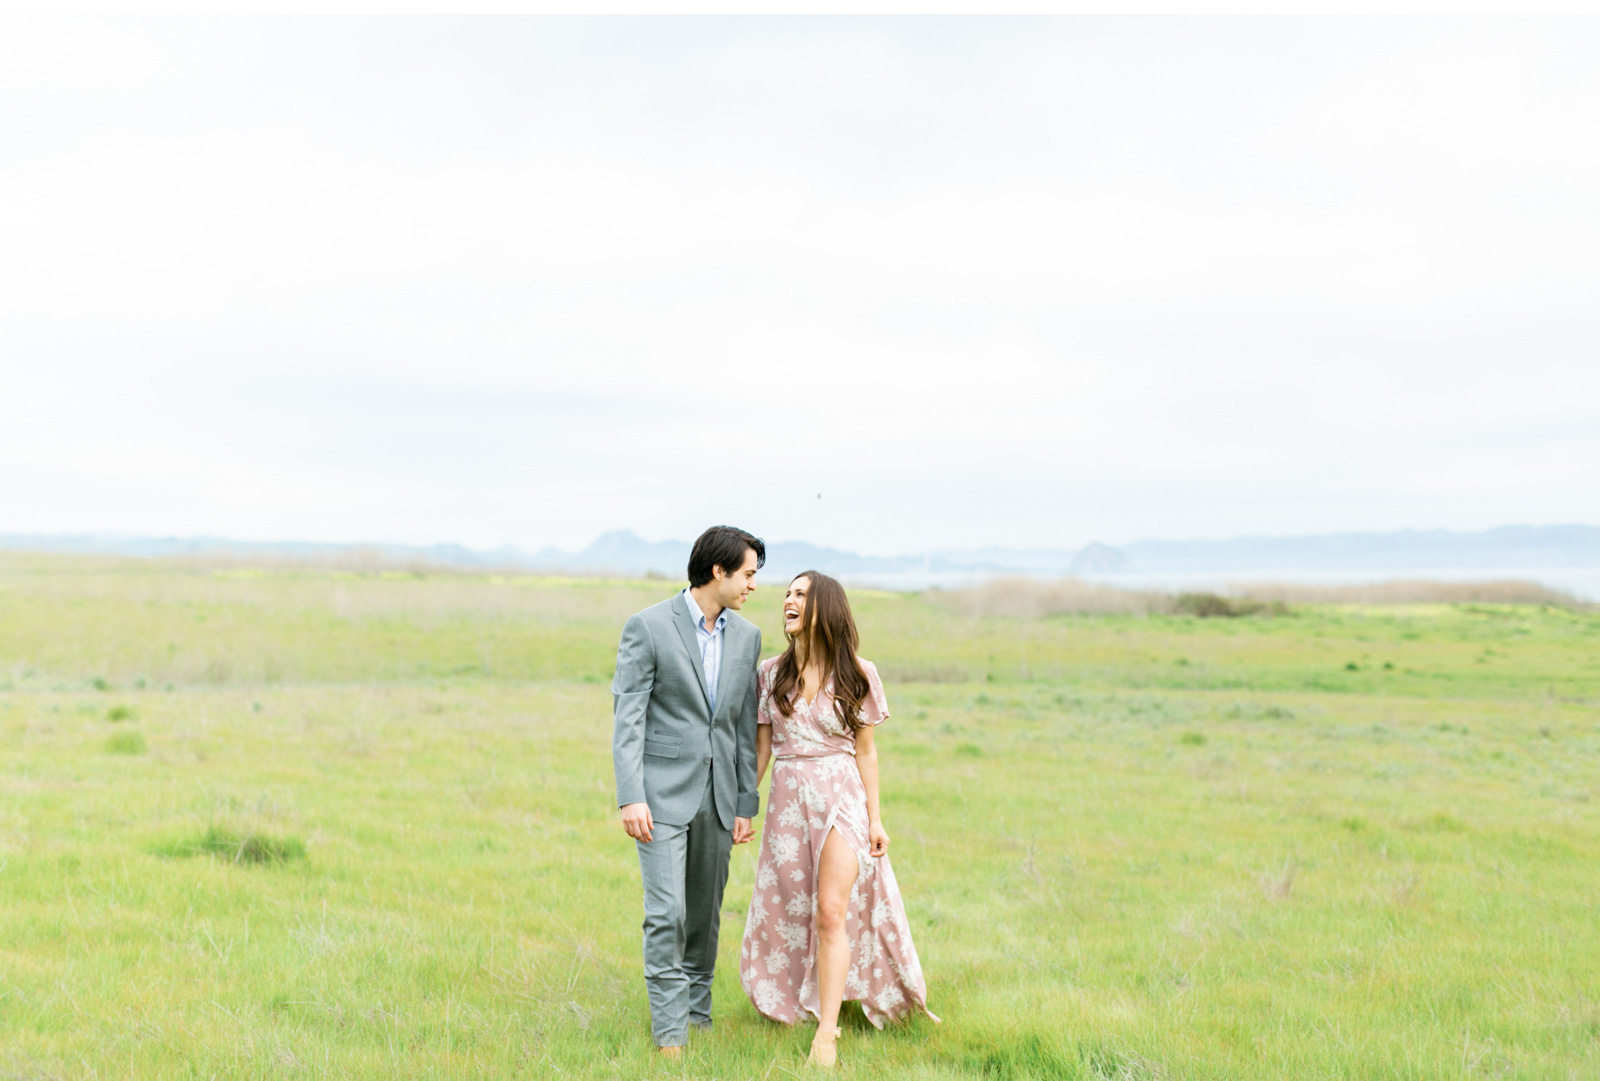 Santa-Barbara-Wedding-Photographer-Style-Me-Pretty-Natalie-Schutt-Photography_13.jpg